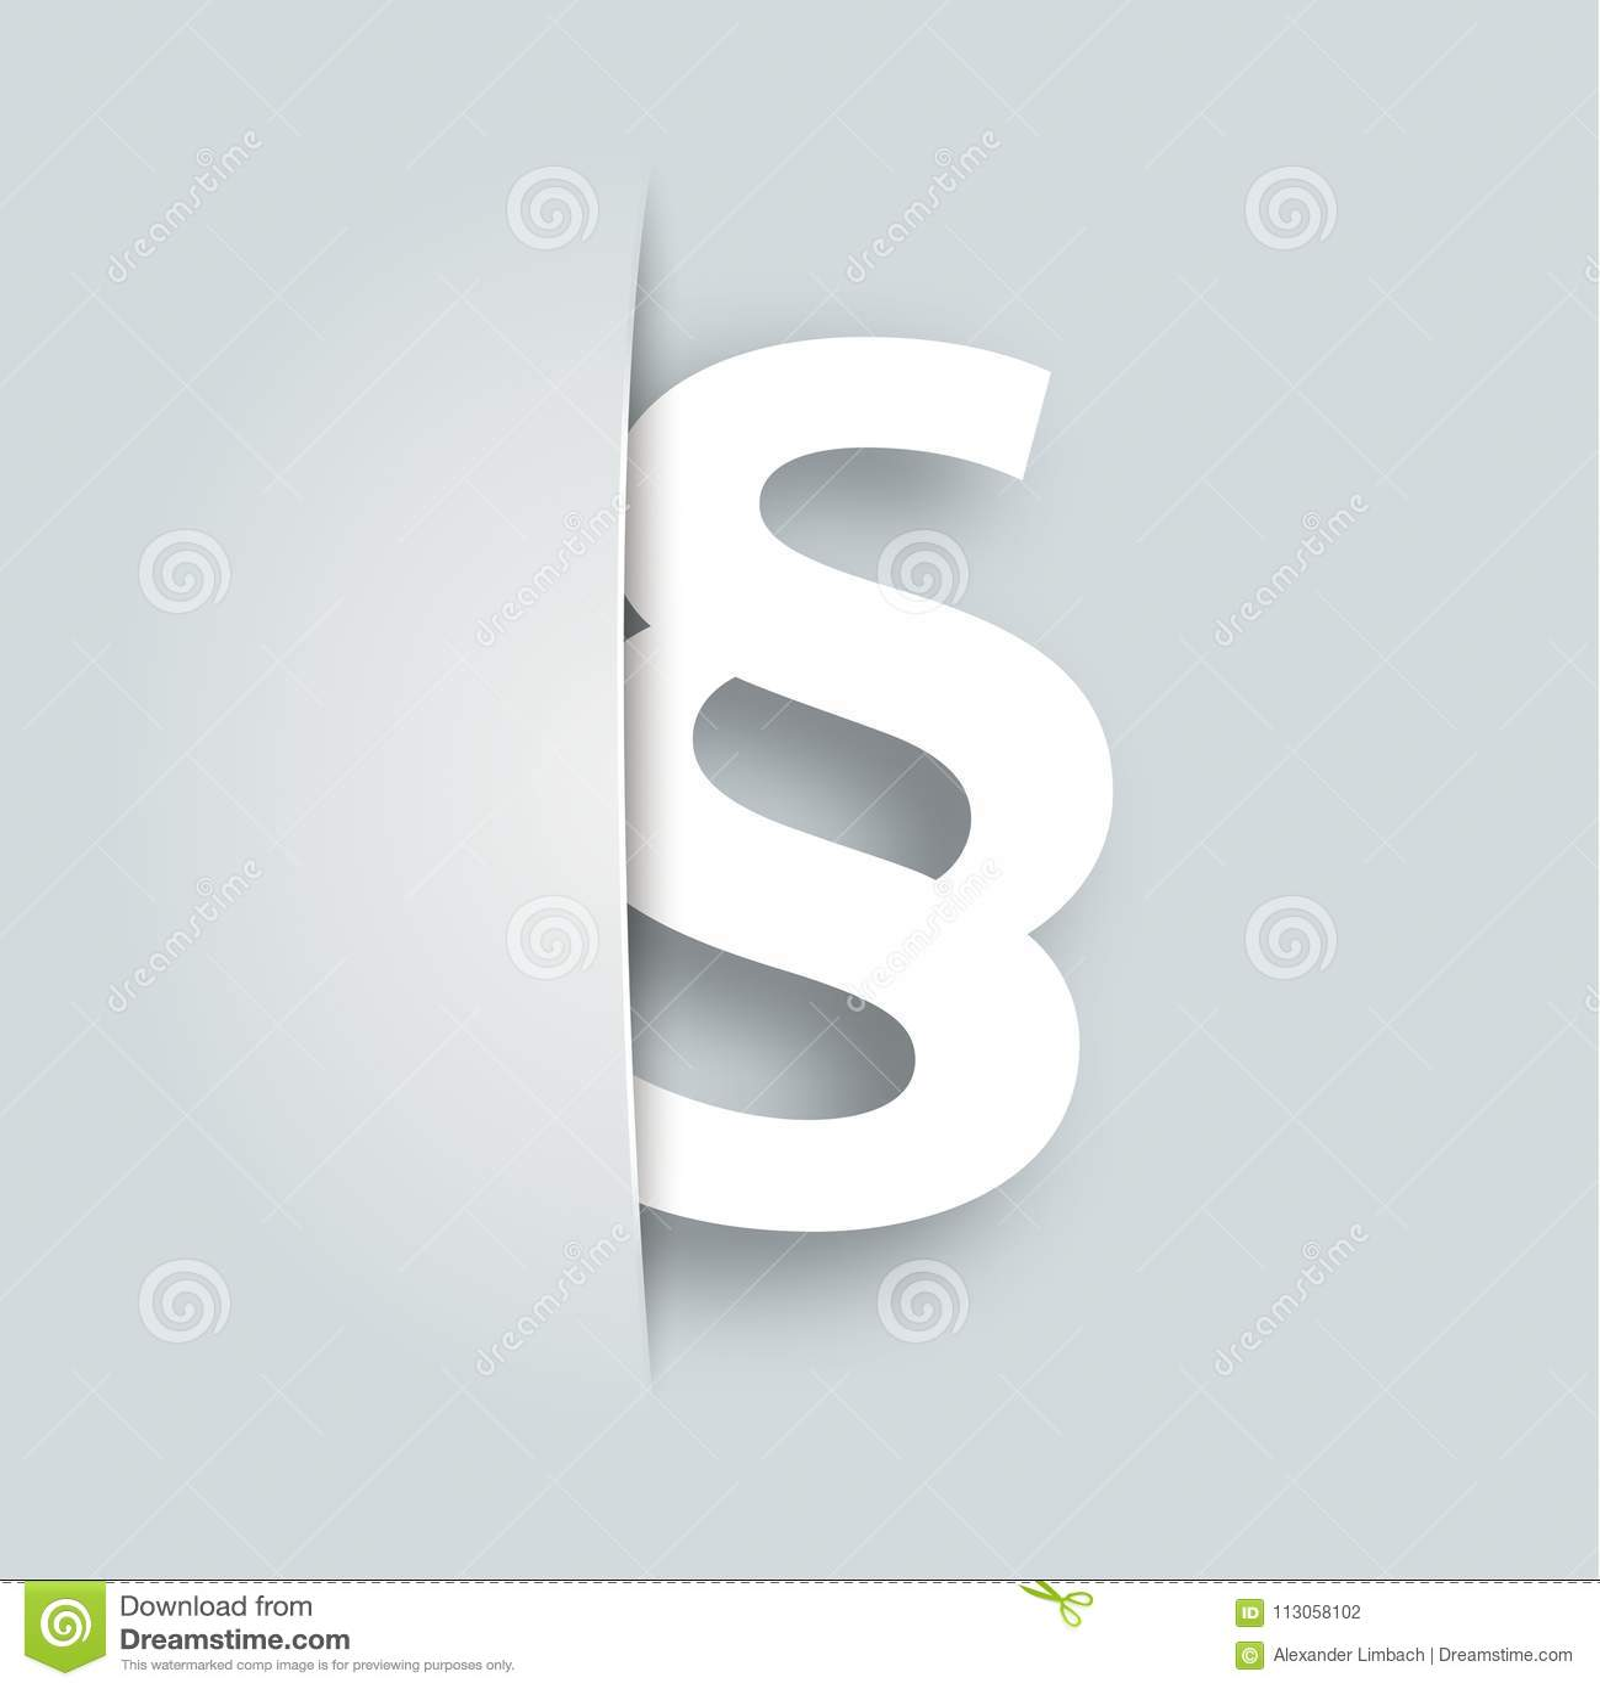 Paragraph essay symbol